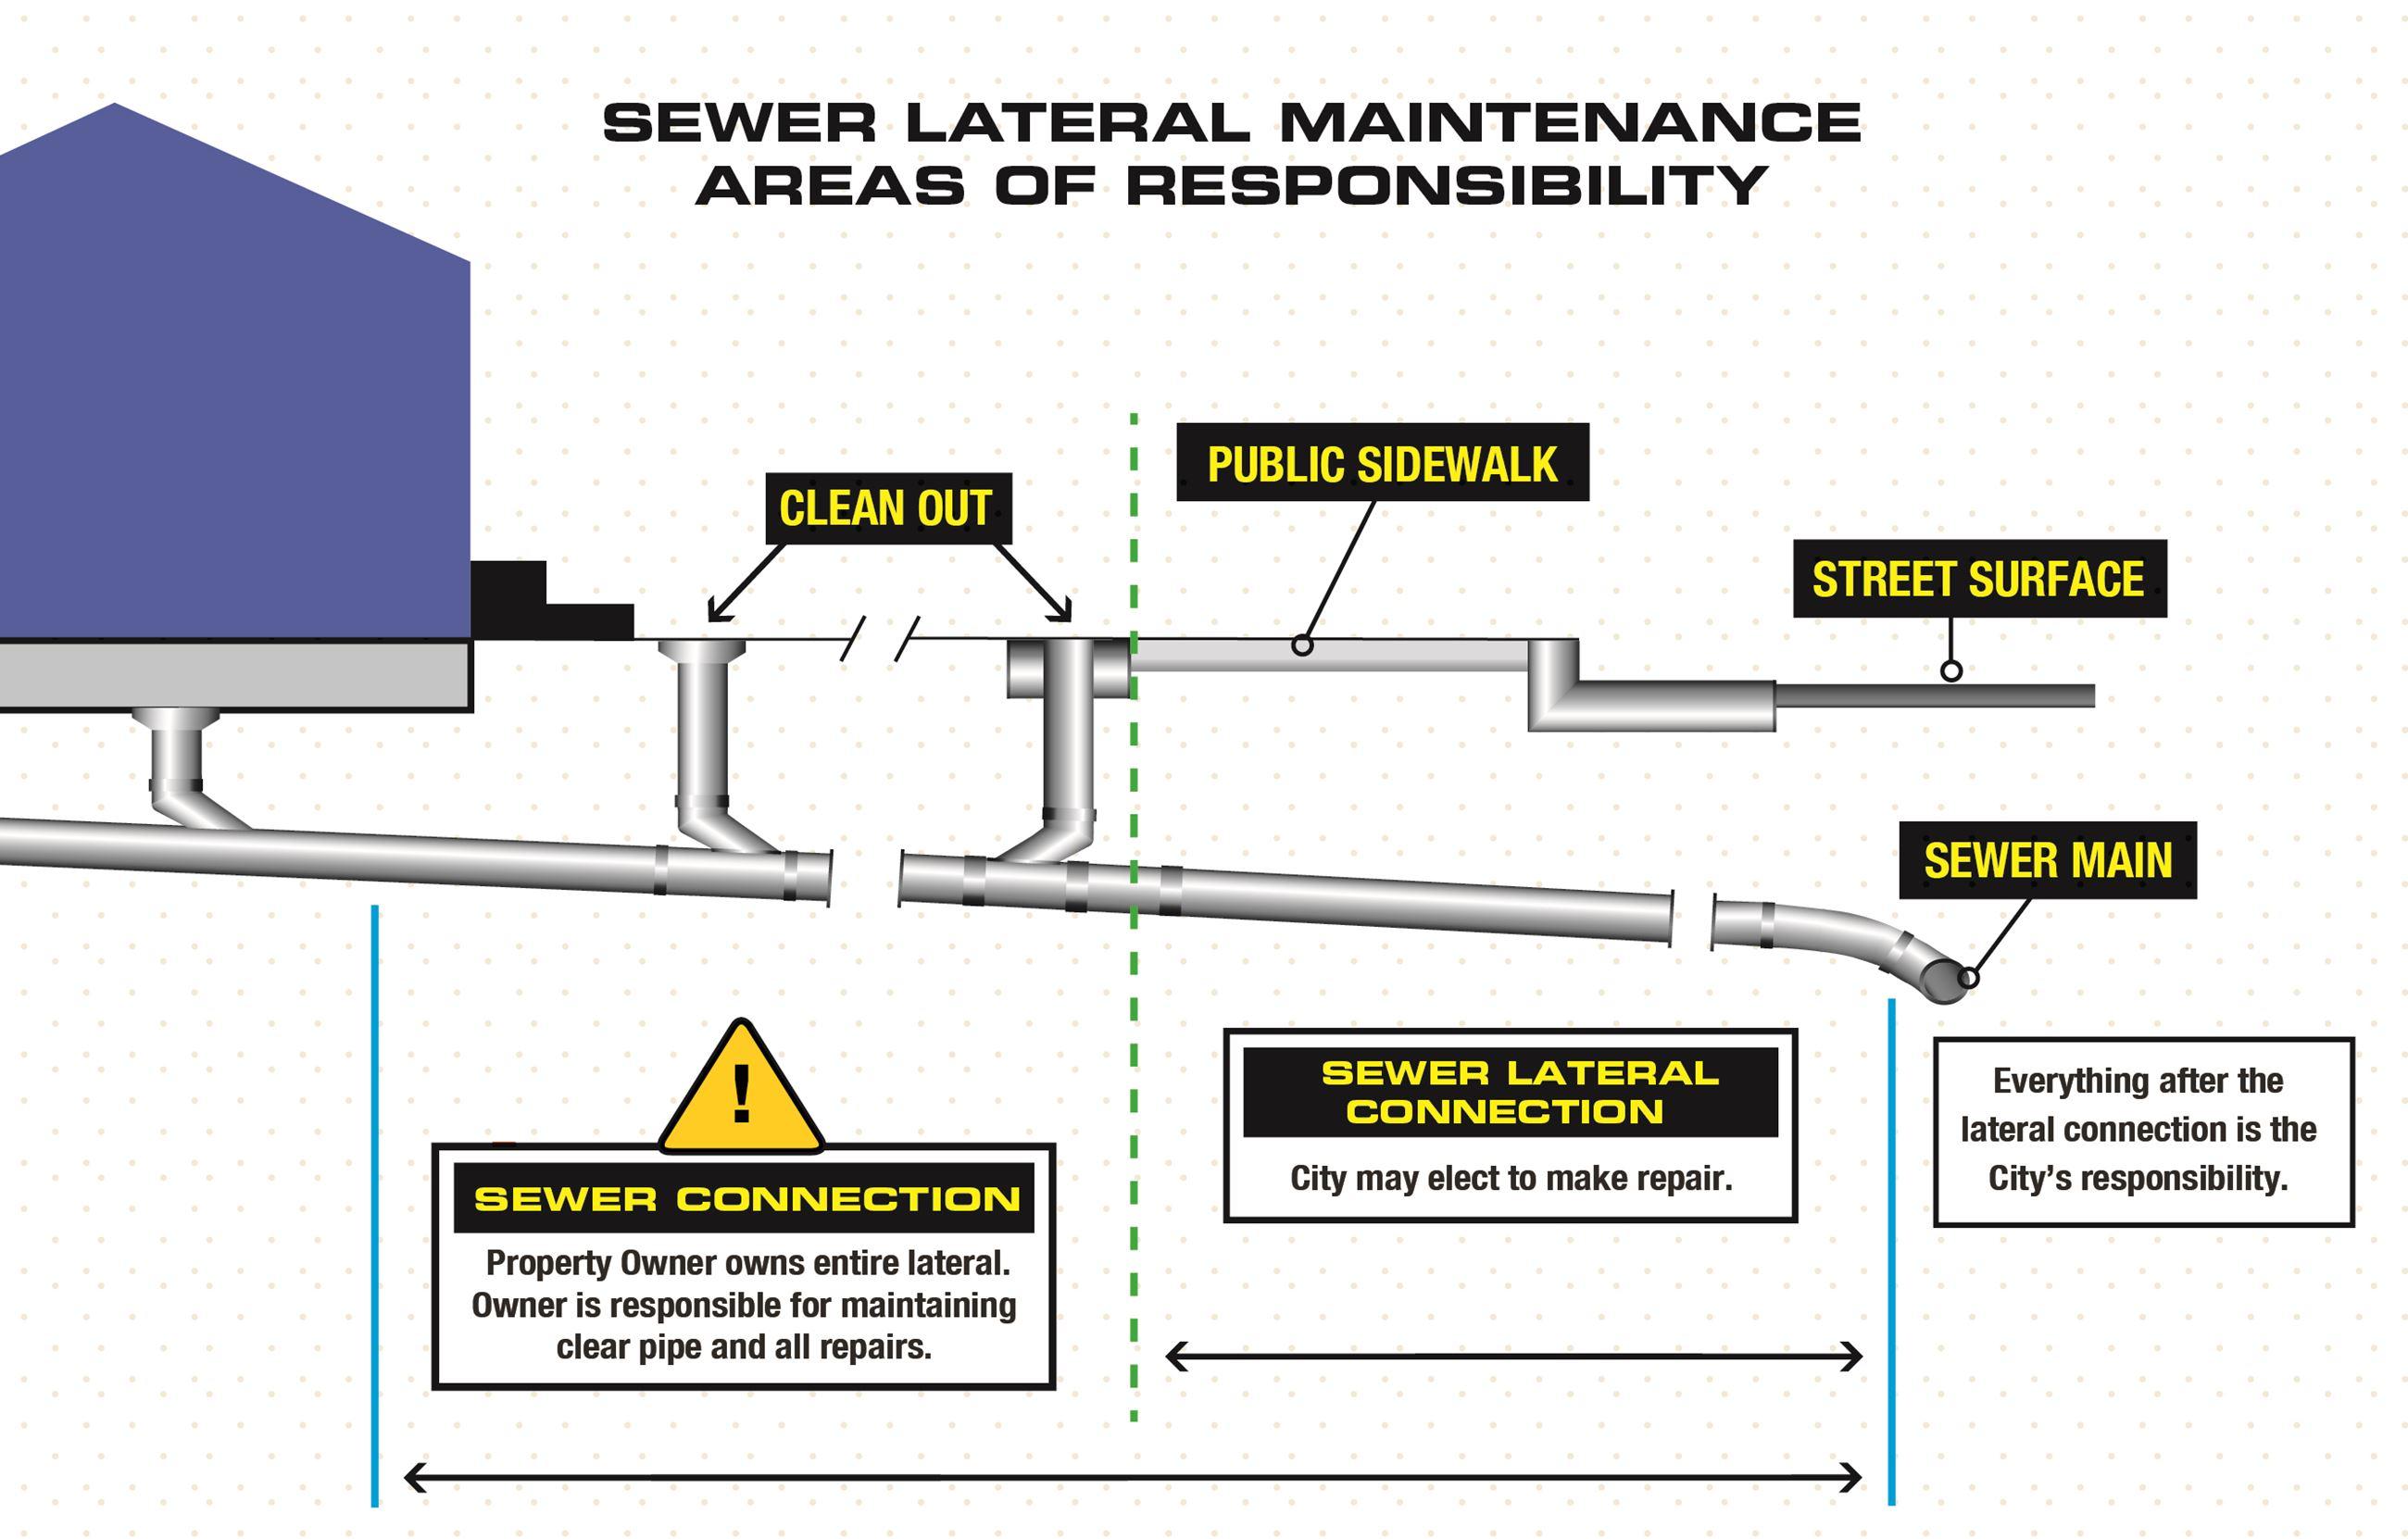 srw17_sewerlateral